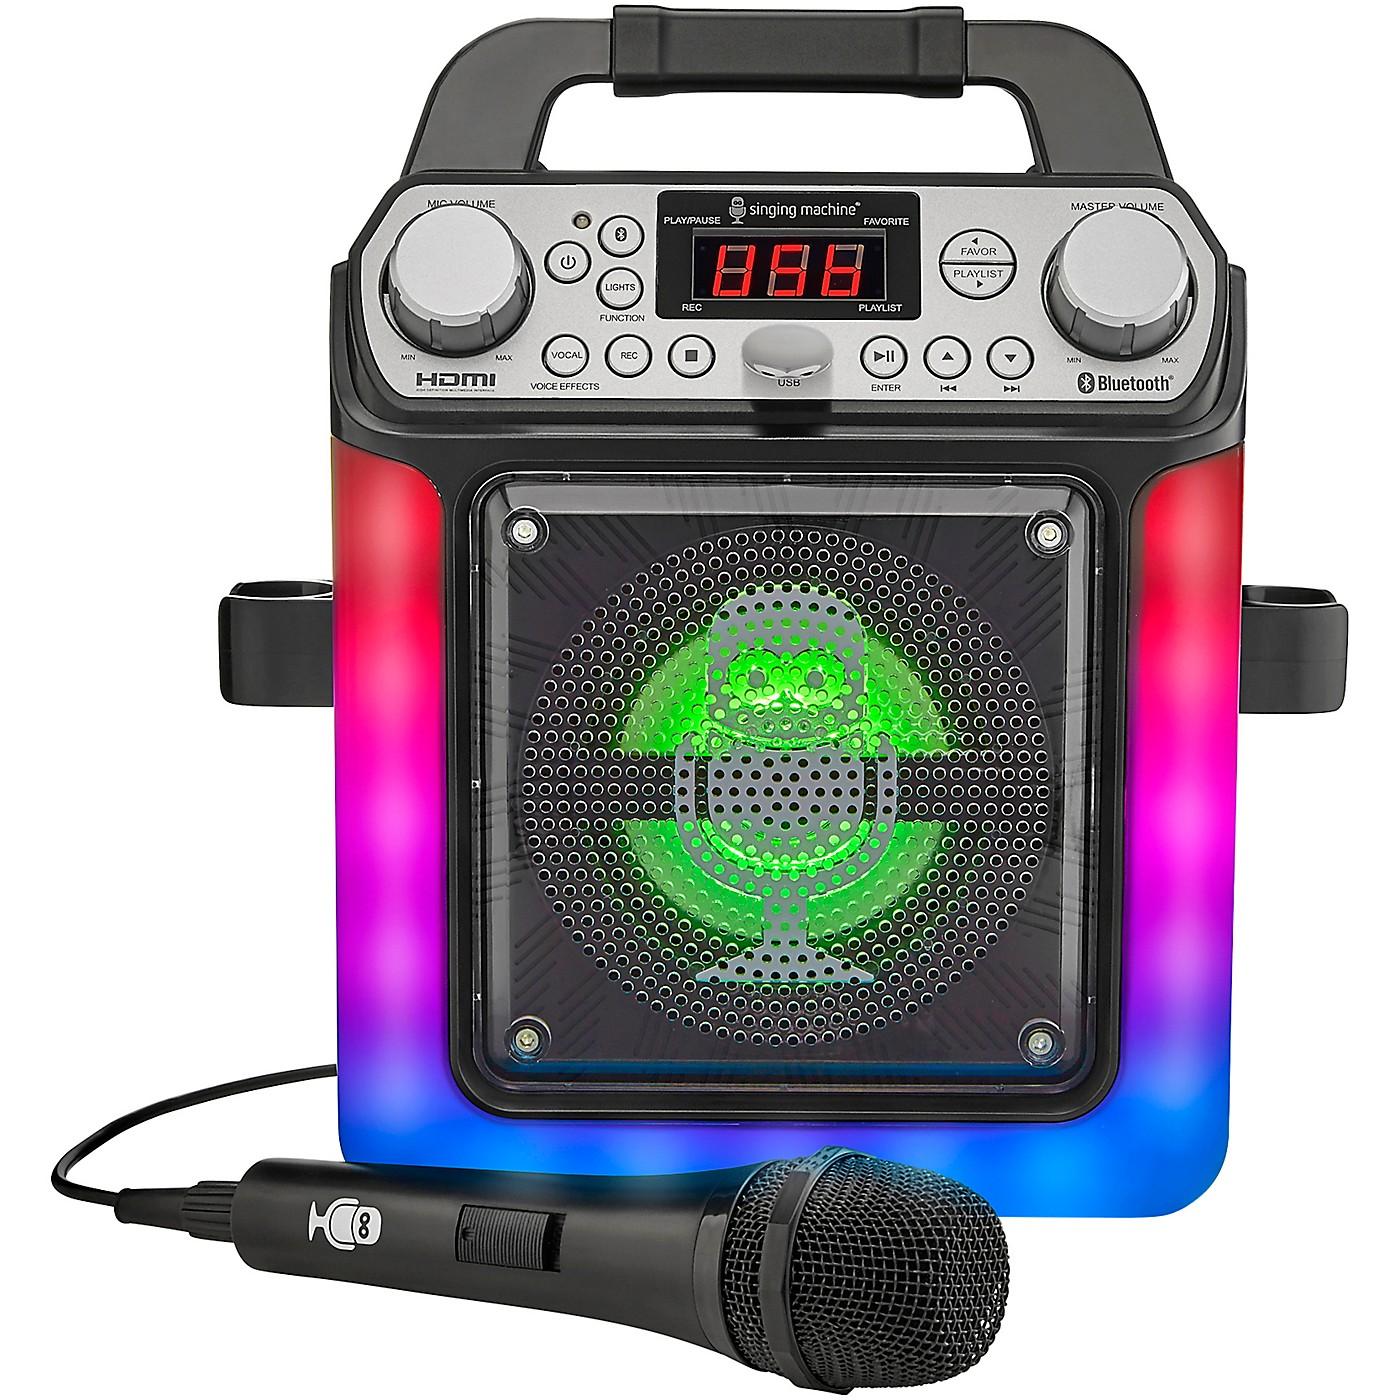 The Singing Machine SML652BK HDMI Groove Mini thumbnail